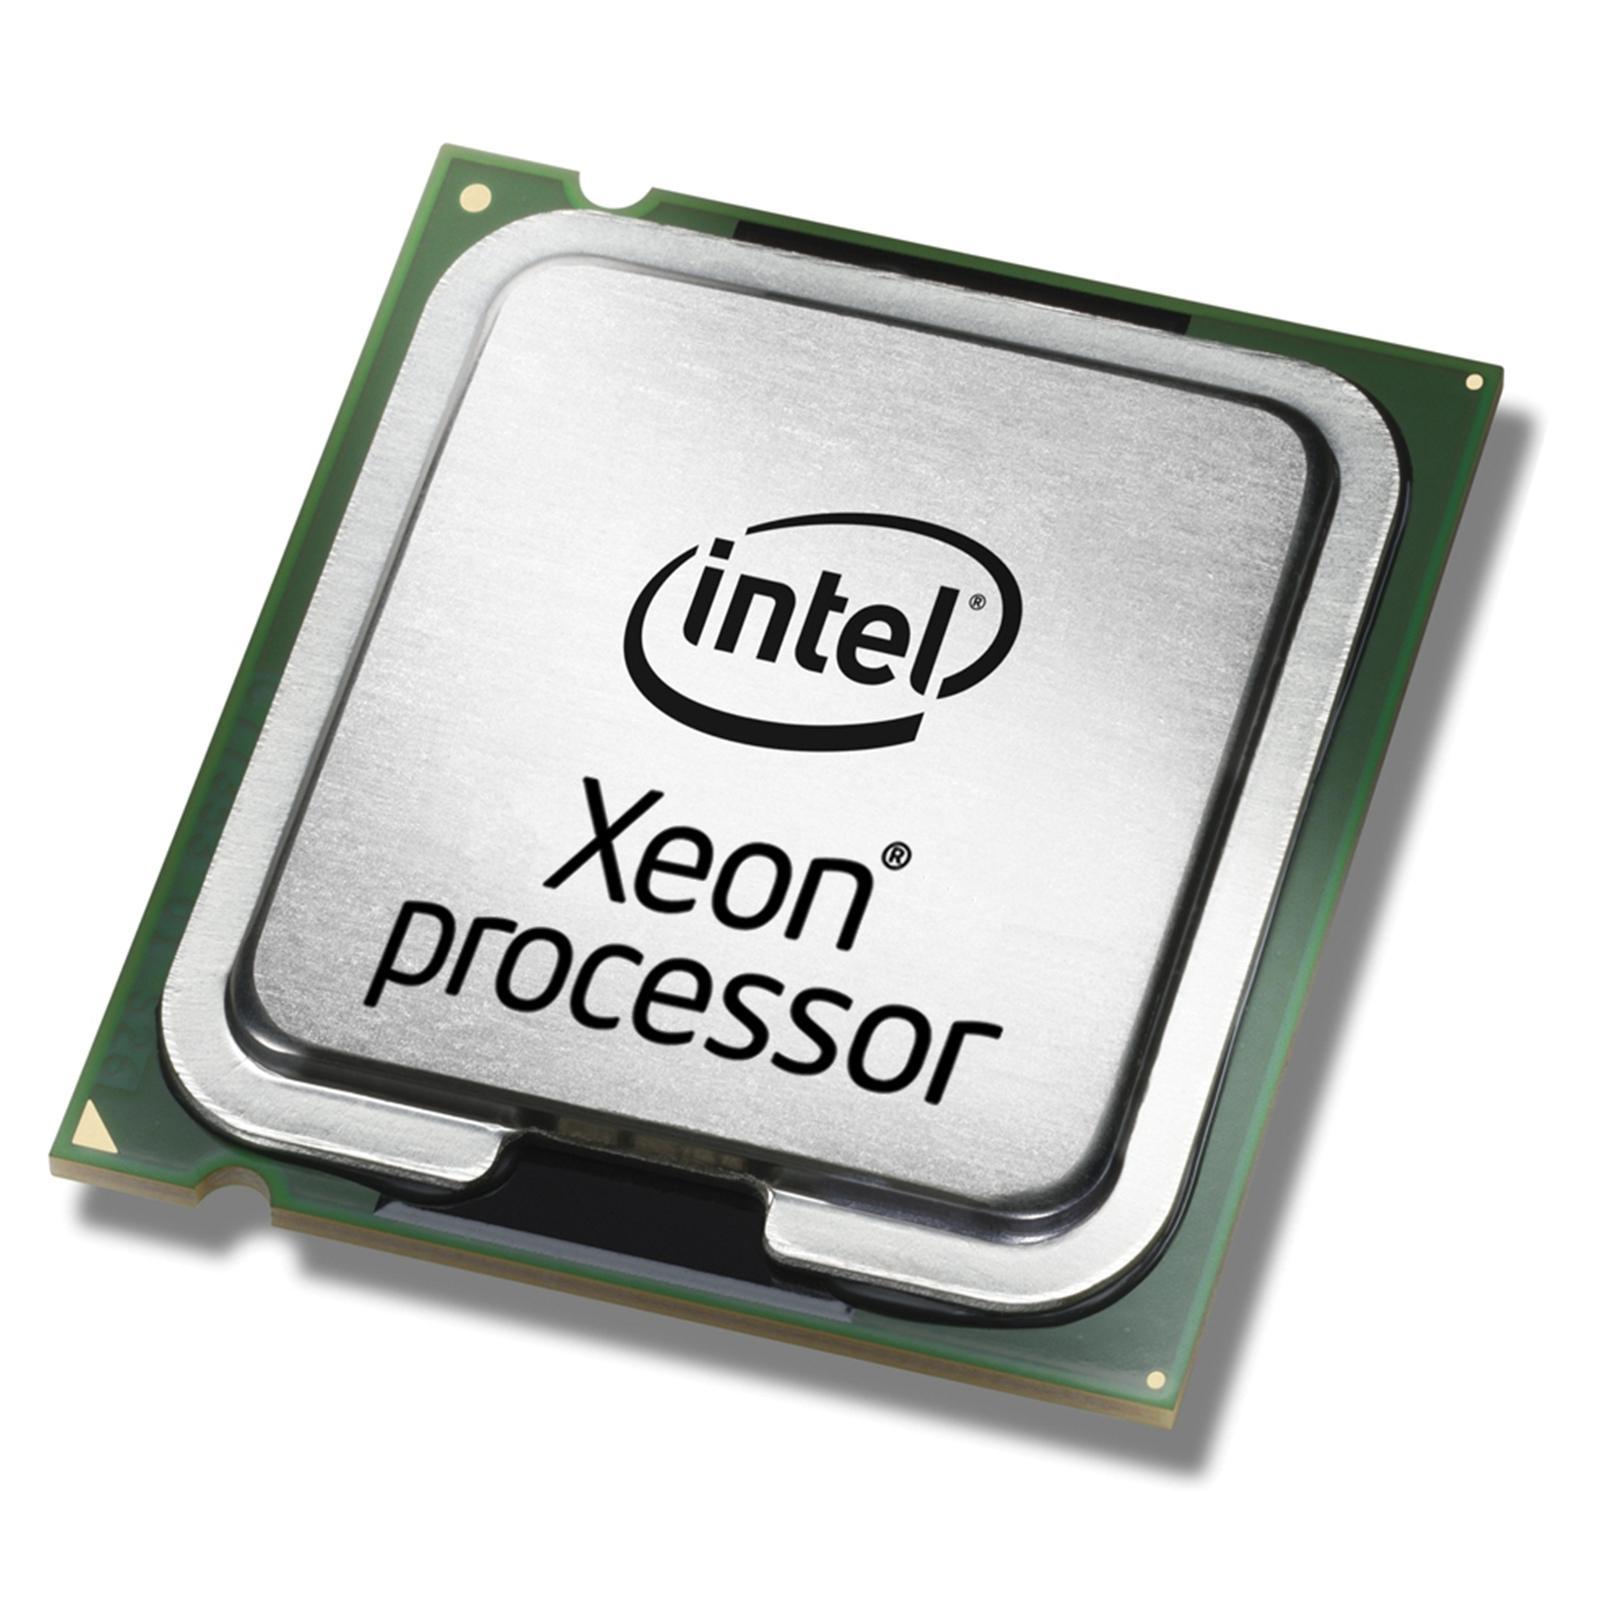 System x Xeon Processor E5-2603 v4 6C 1.7GHz